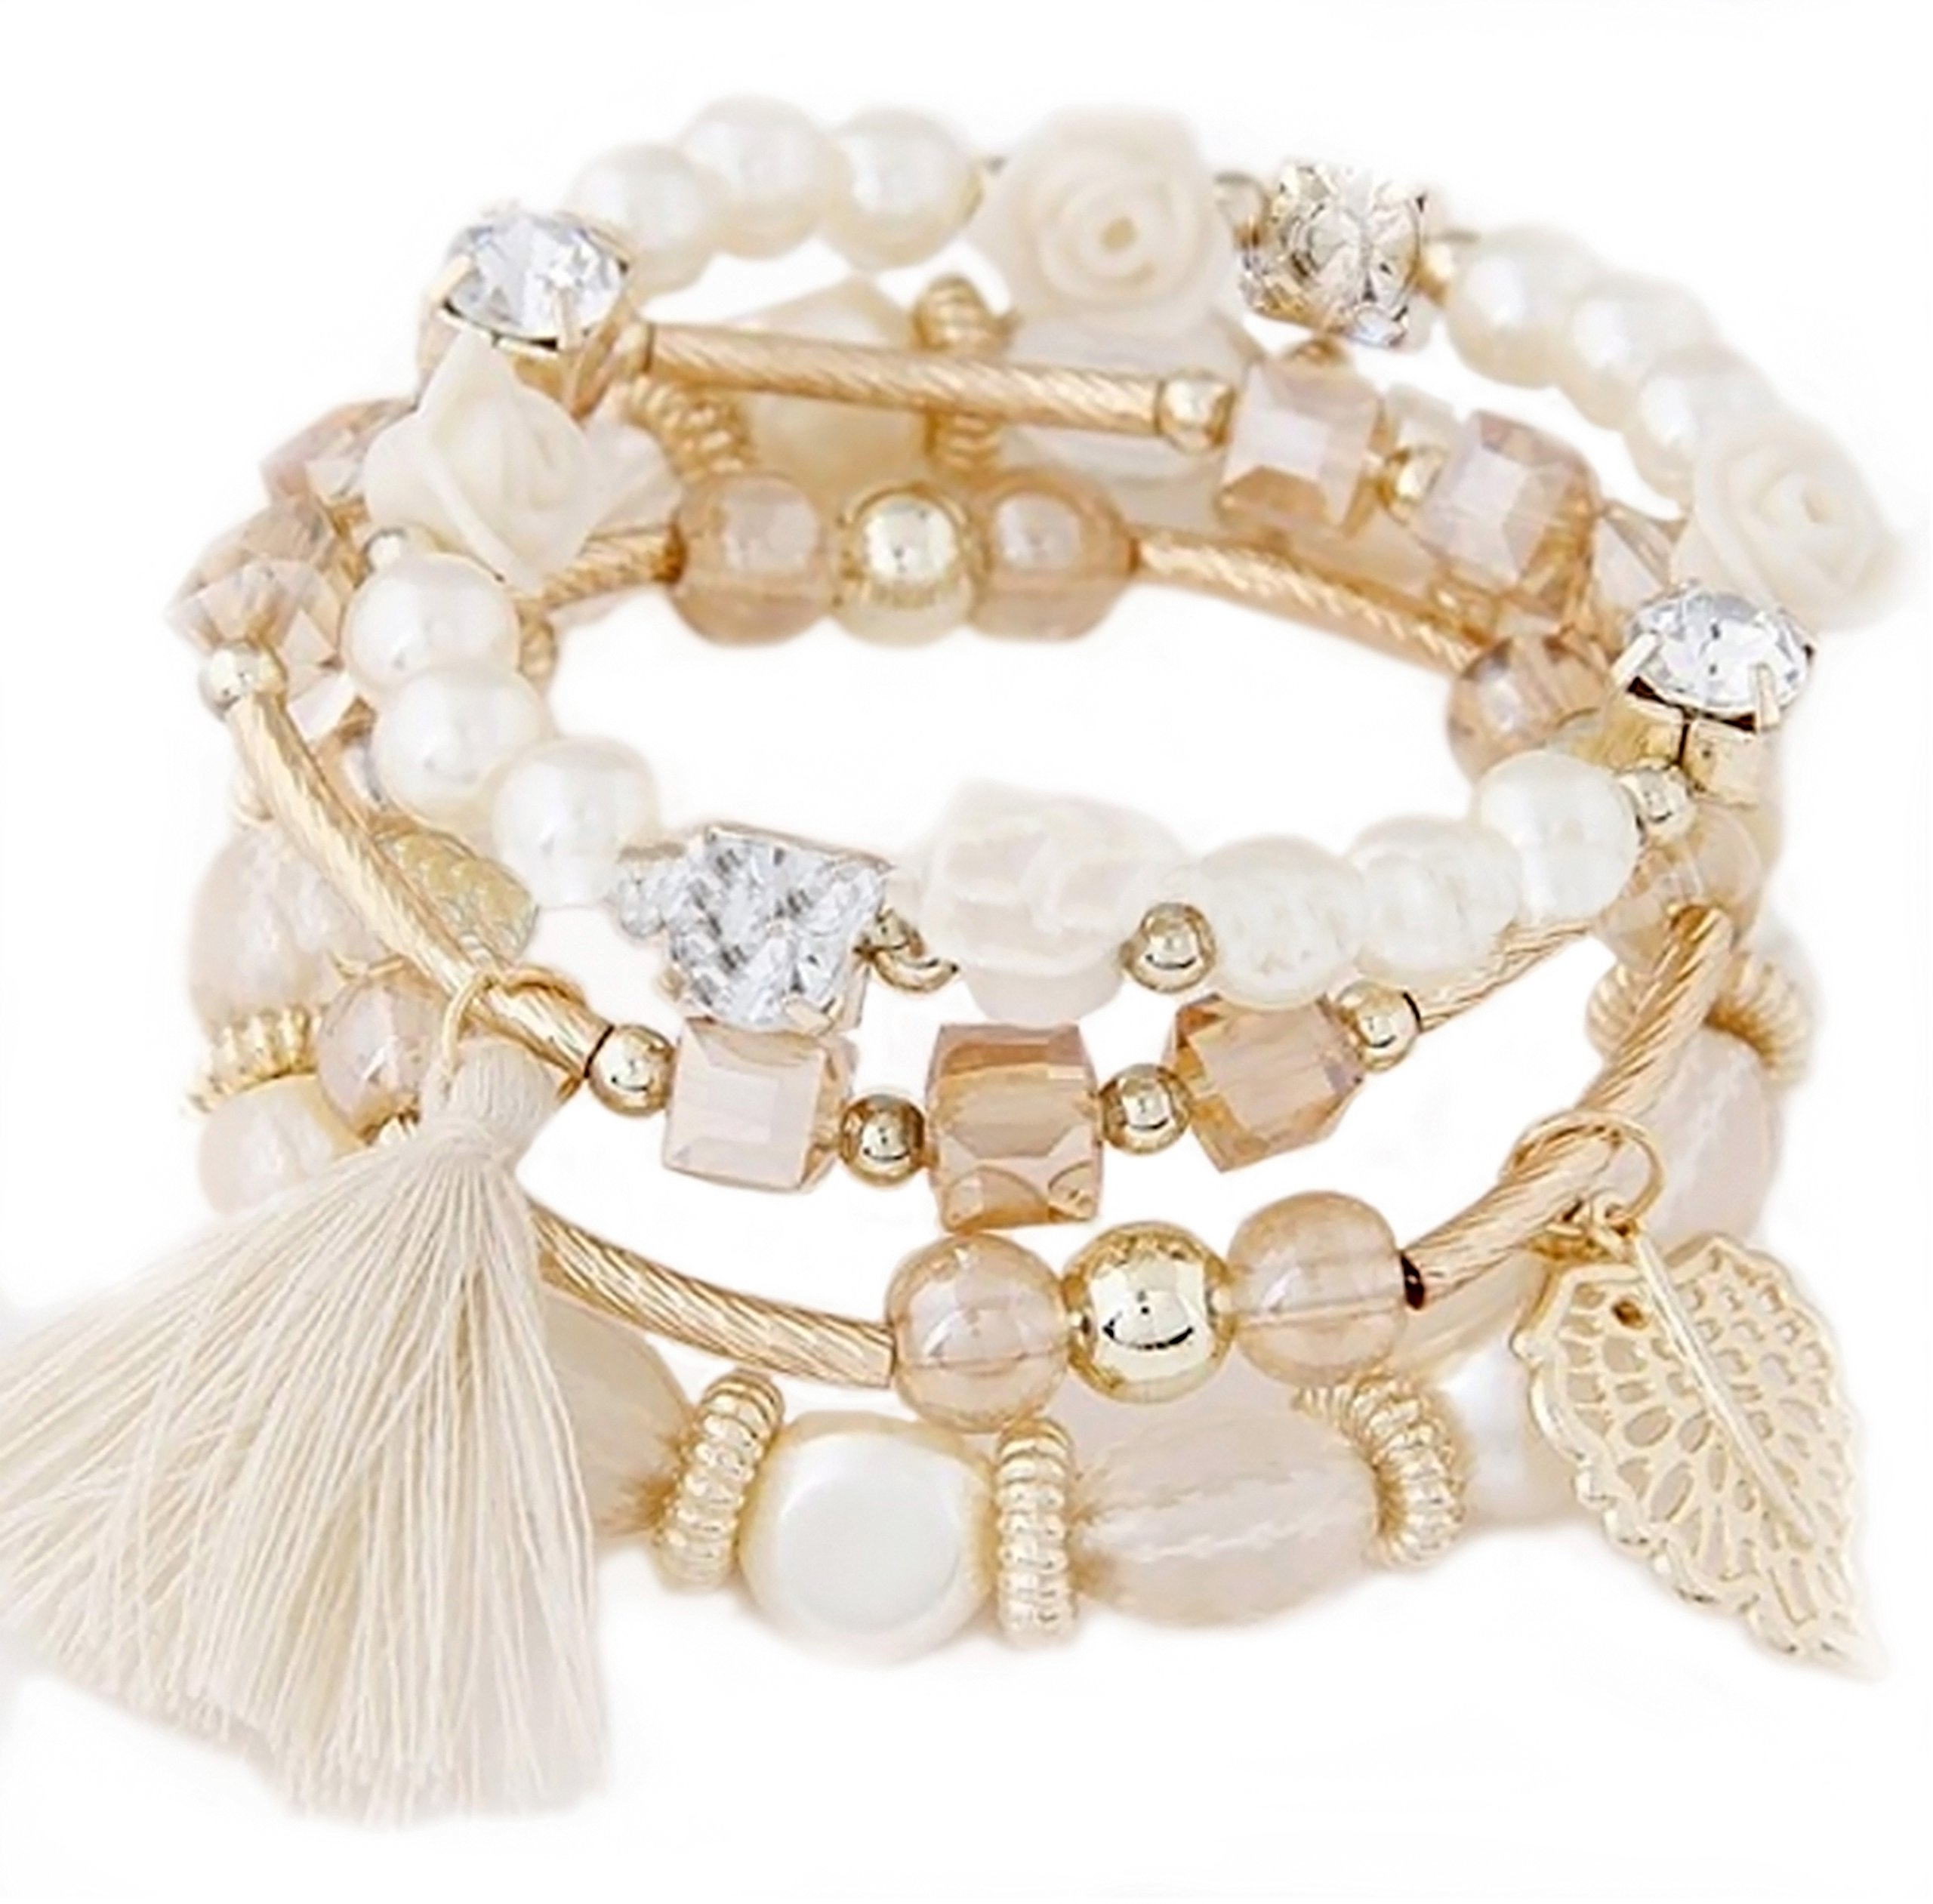 Eliana and Eli ''I Love Blooming Spring White Bohemian Pearl Tassel Stretch Handmade Bracelet (Blanco Bohemia Tassel Stretch Pulsera Hecha A Mano)- Great Valentine Jewelry Package Gift Mom